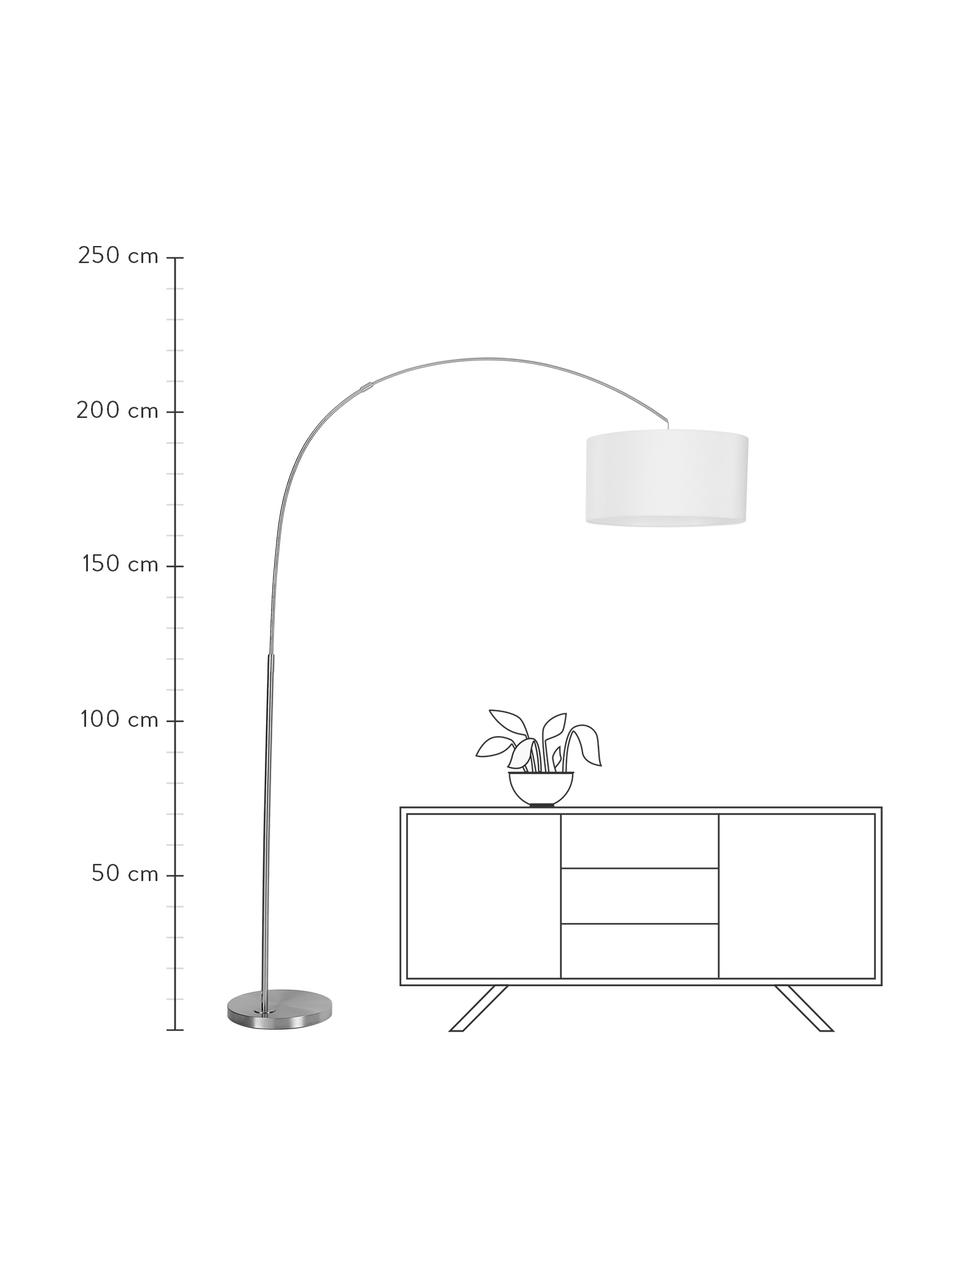 Große Bogenlampe Niels in Chrom, Lampenfuß: Metall, gebürstet, Lampenschirm: Textil, Weiß, Chrom, Transparent, Ø 50 x H 218 cm